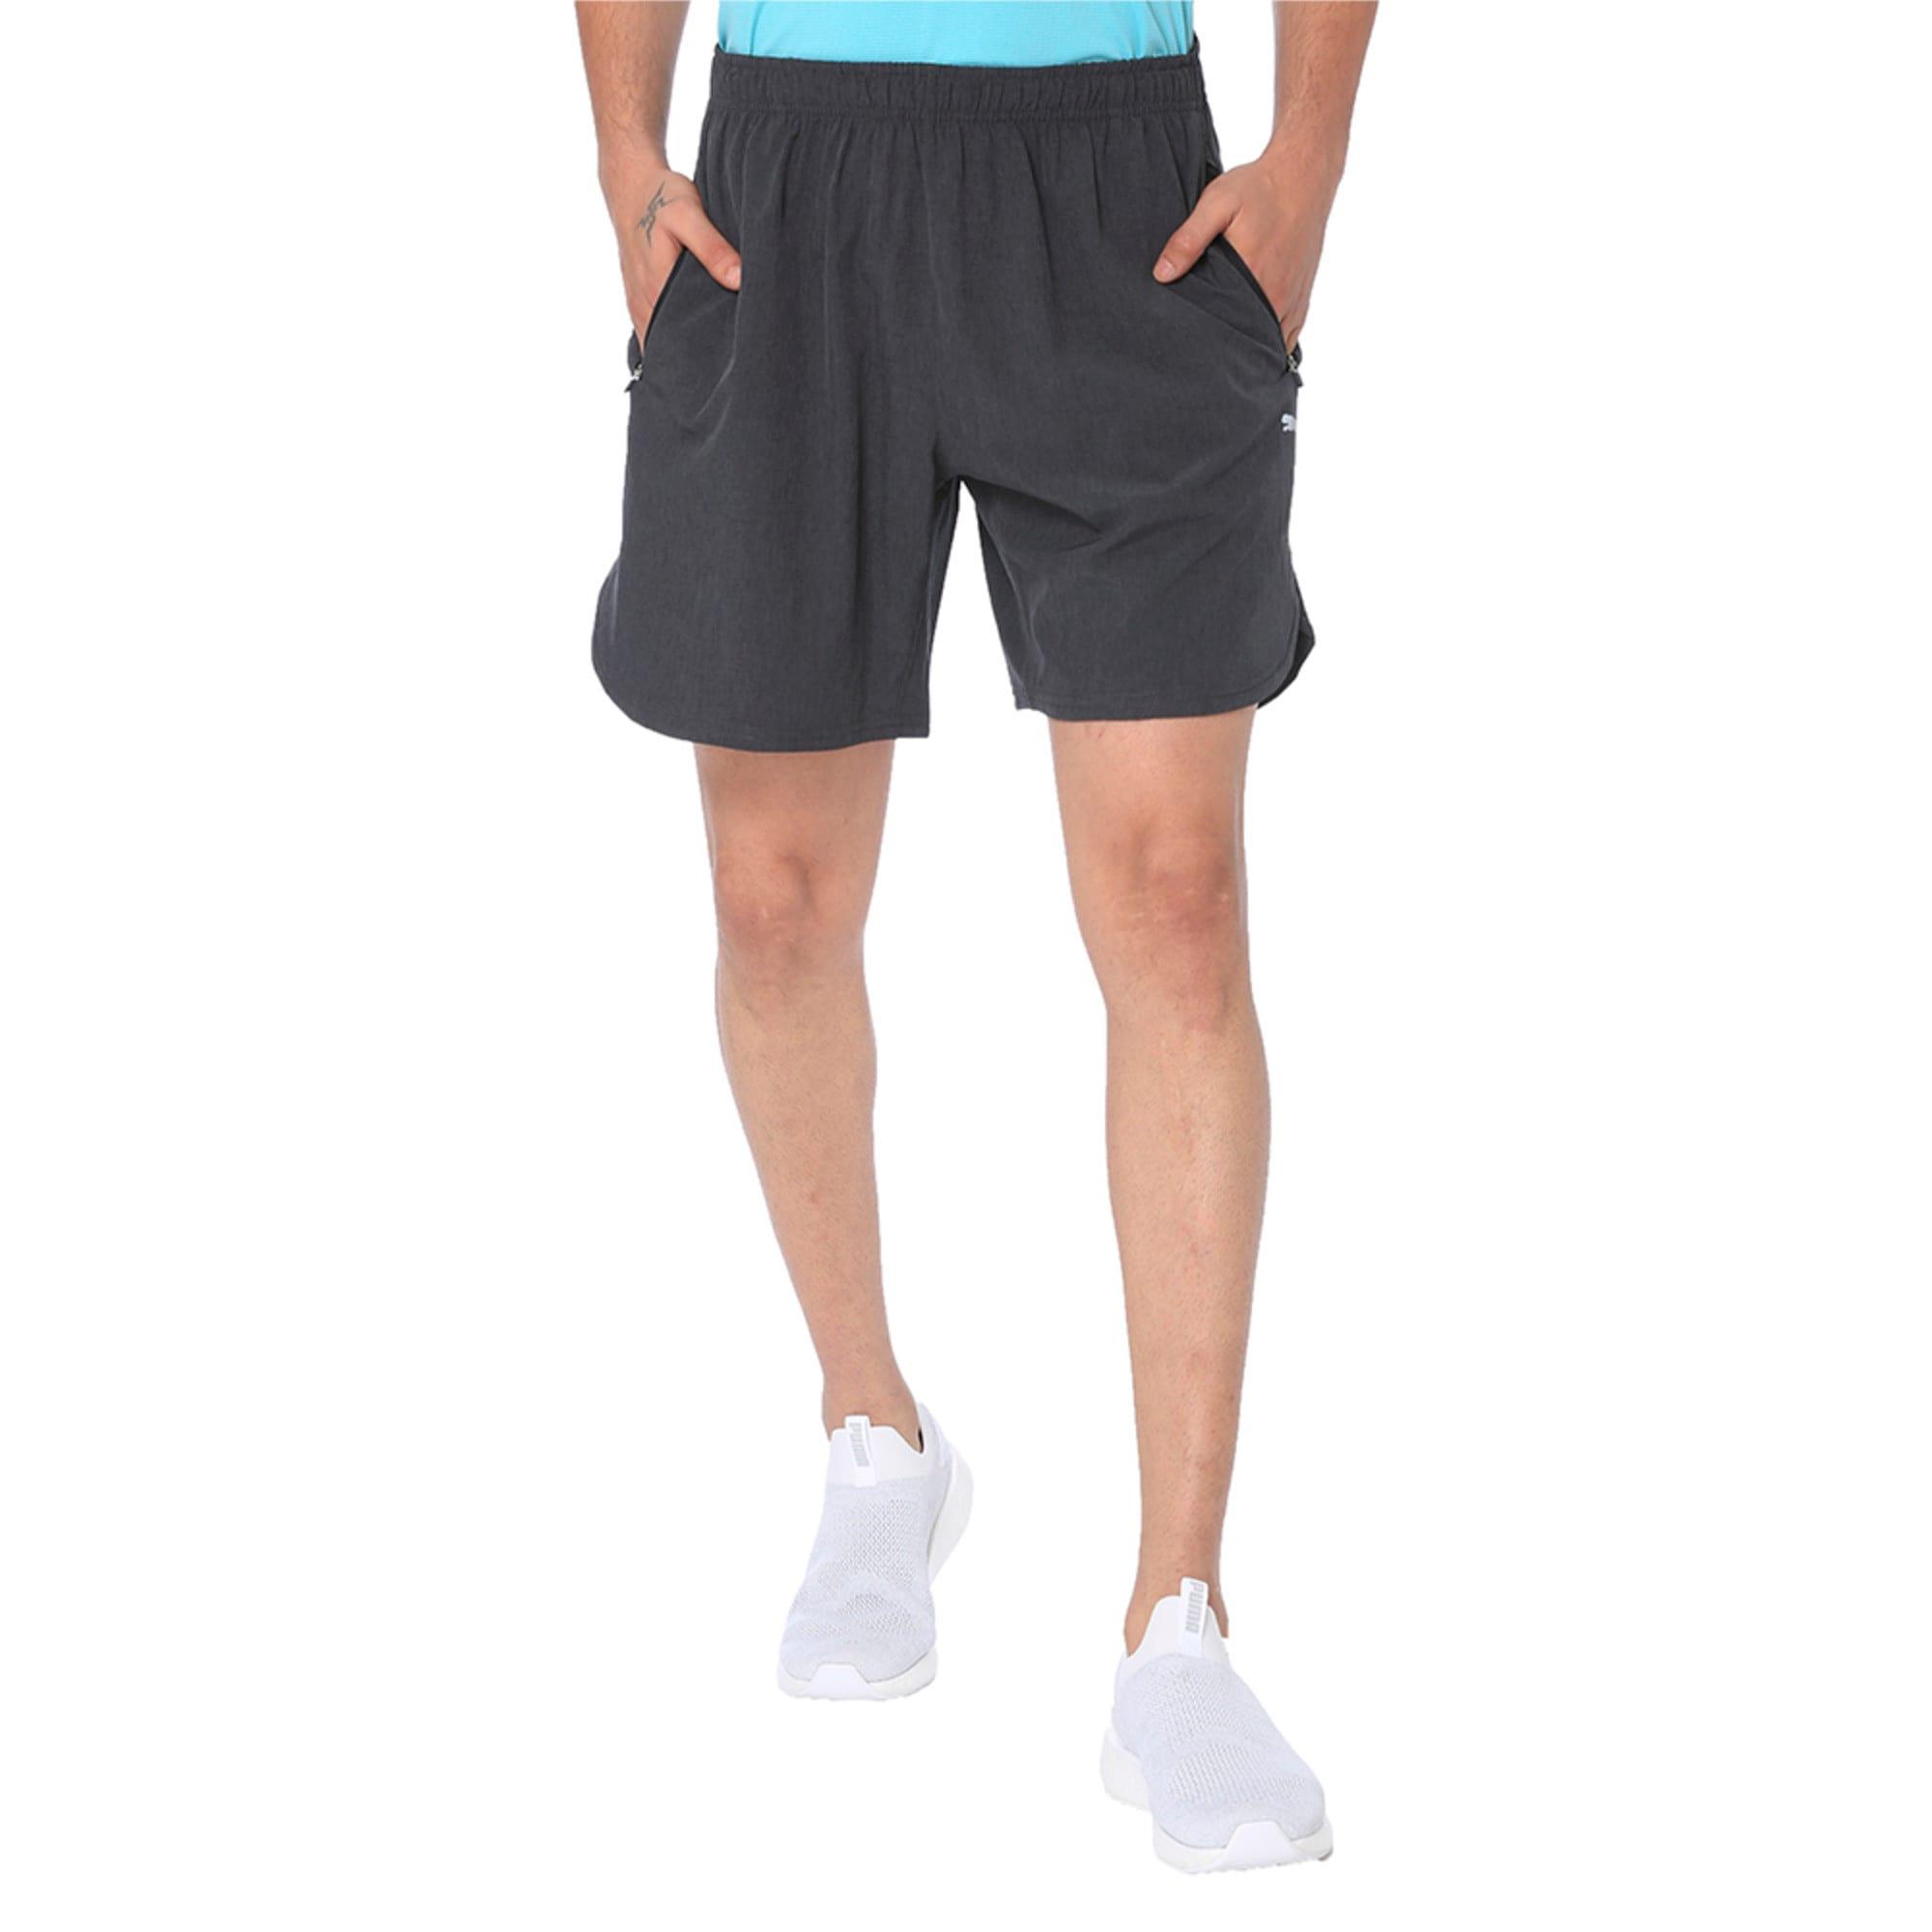 Thumbnail 4 of one8 VK Men's Active Shorts, Dark Gray Heather, medium-IND